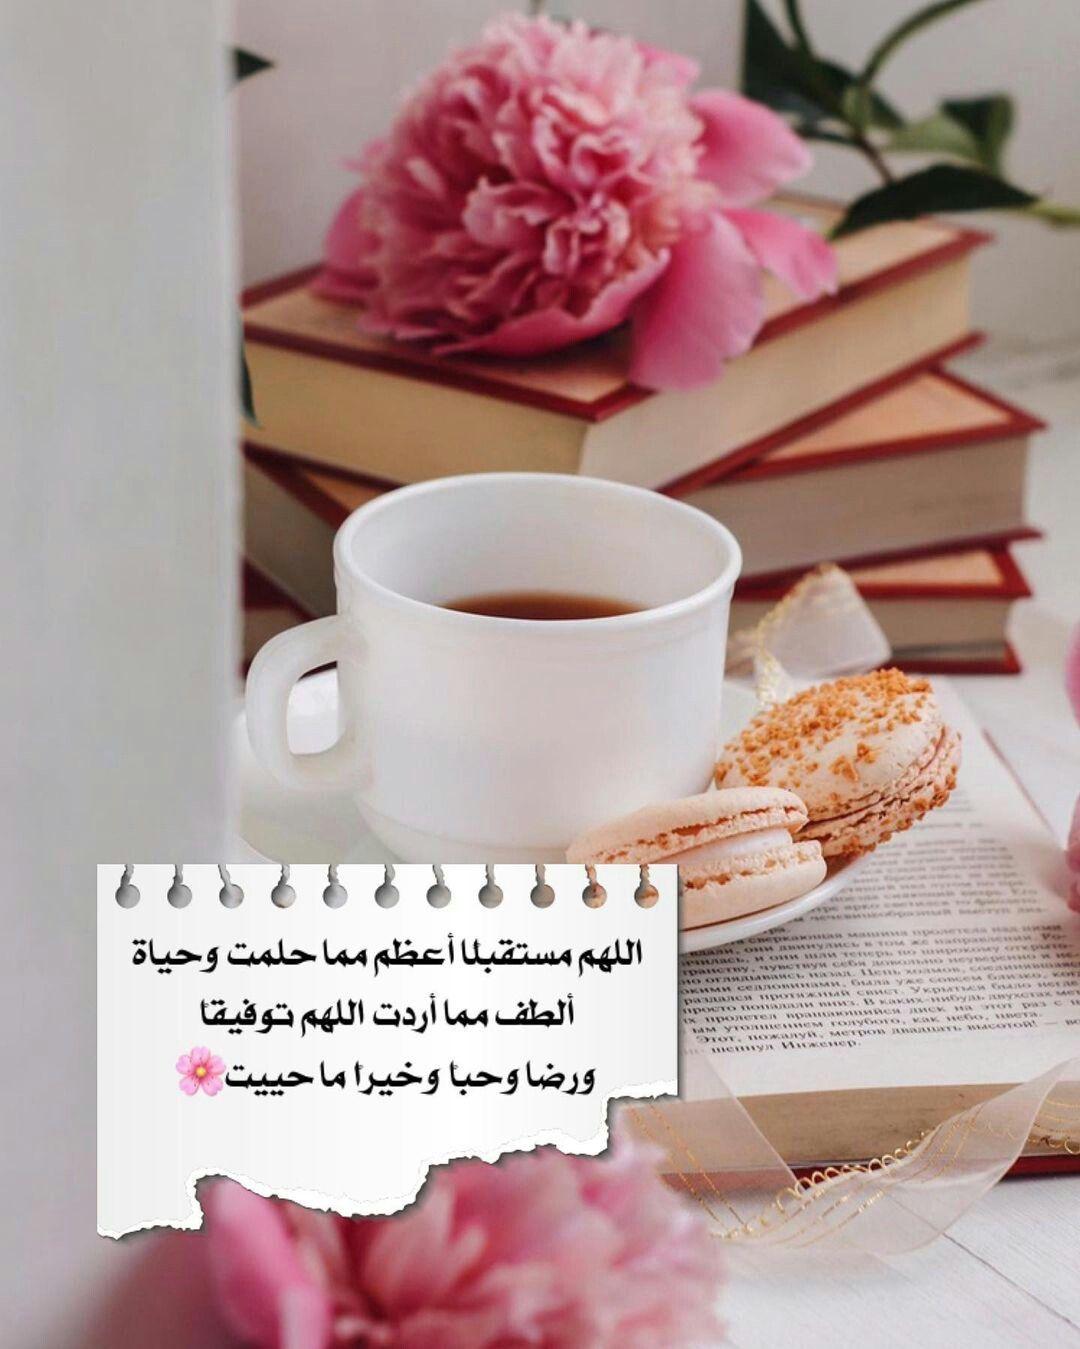 Pin By الصحبة الطيبة On أدعية Islamic Inspirational Quotes Arabic Quotes Inspirational Quotes